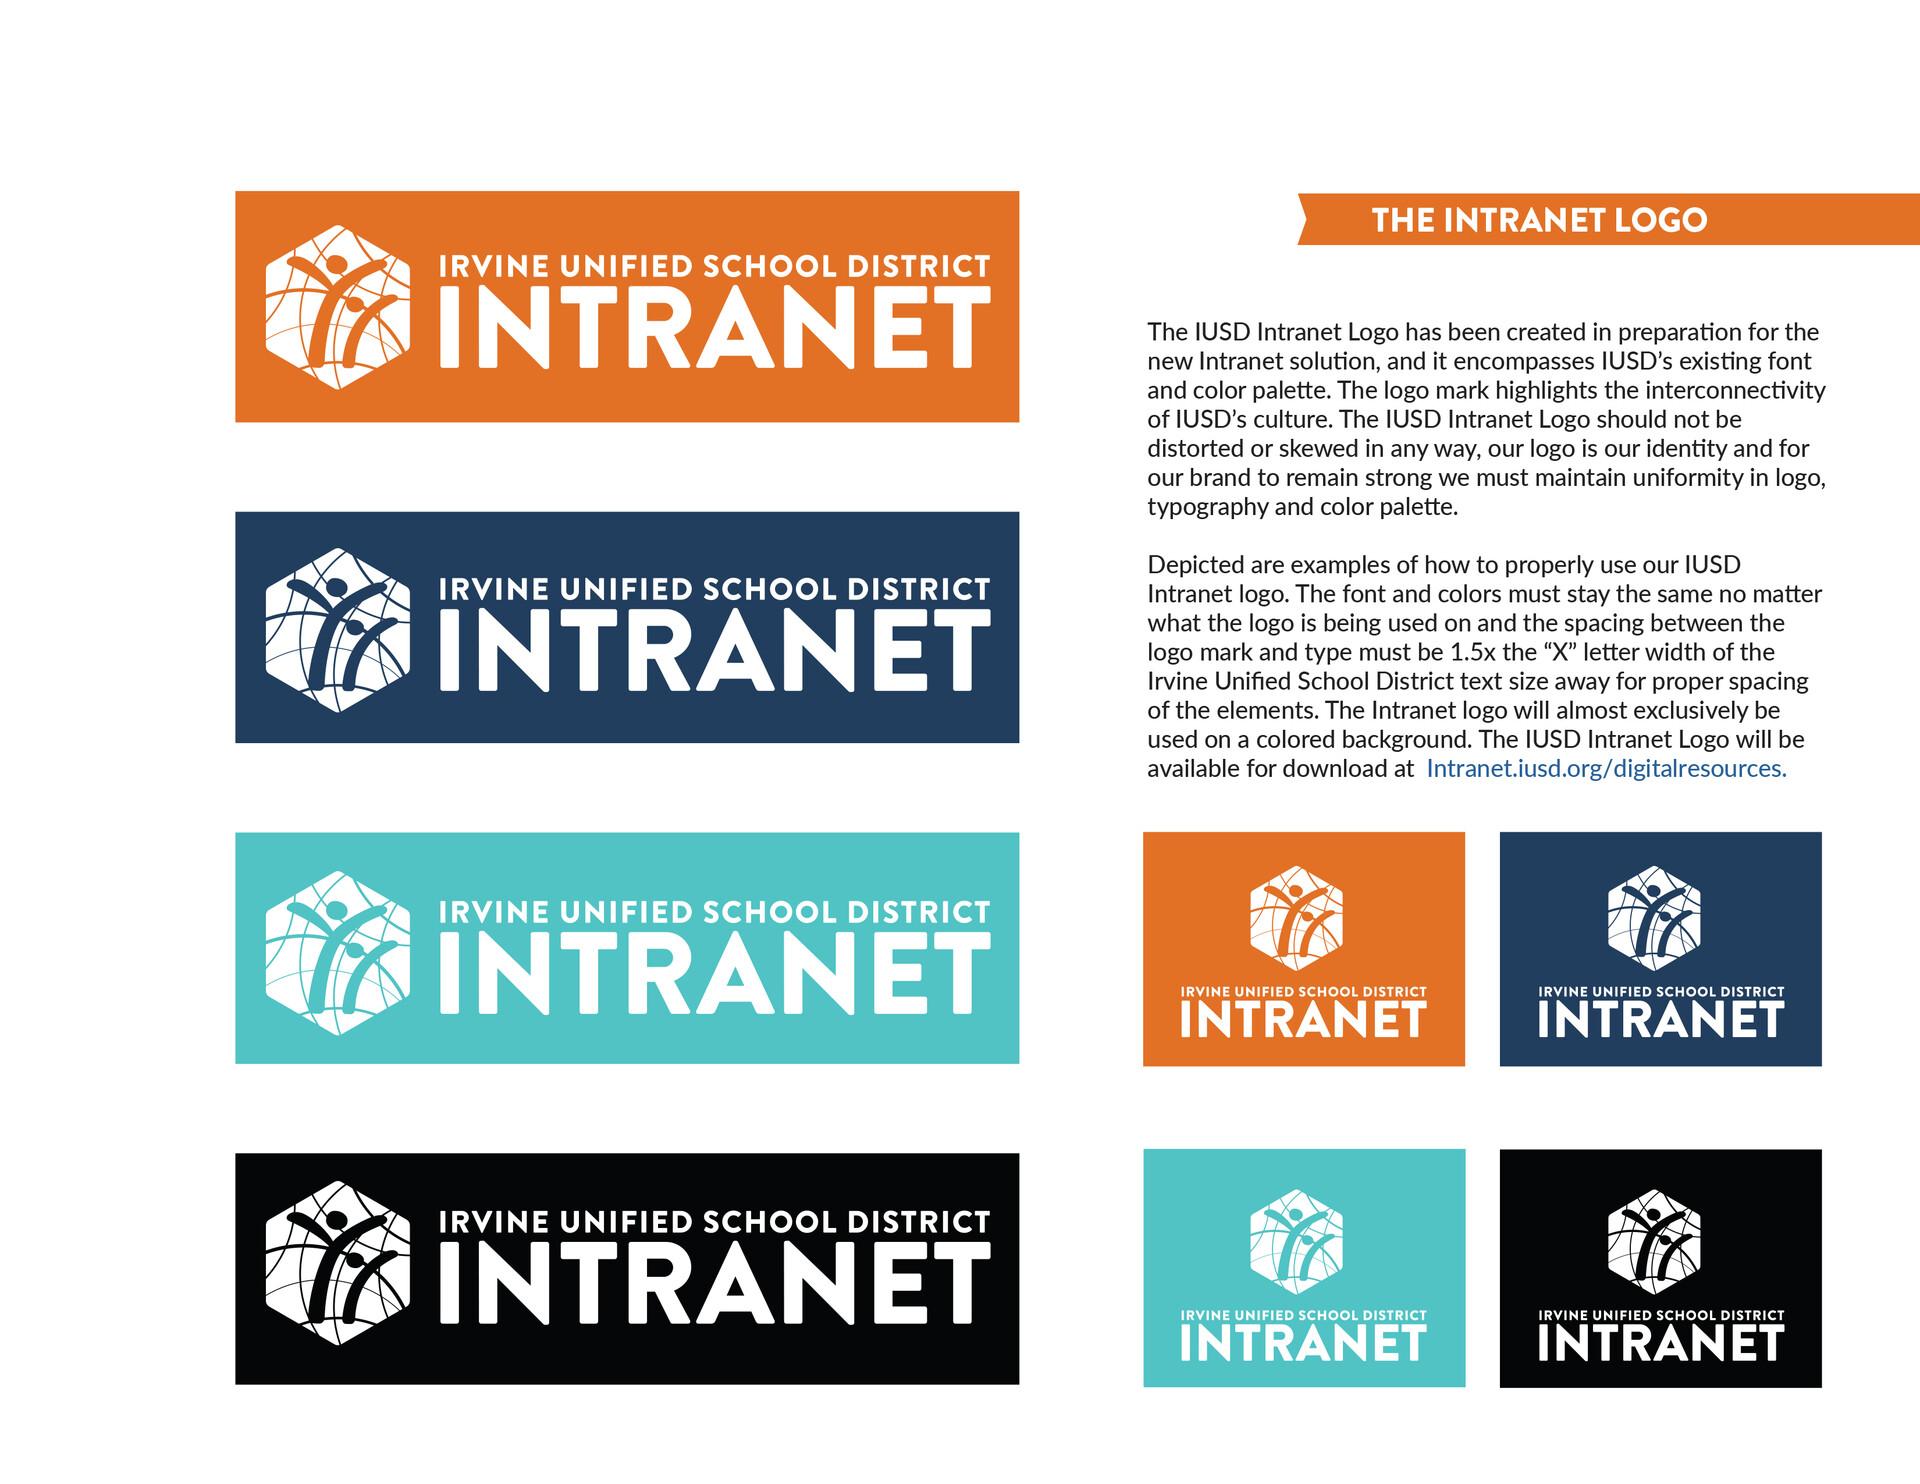 Kyle miller iusd intranet branding manual 2019 5